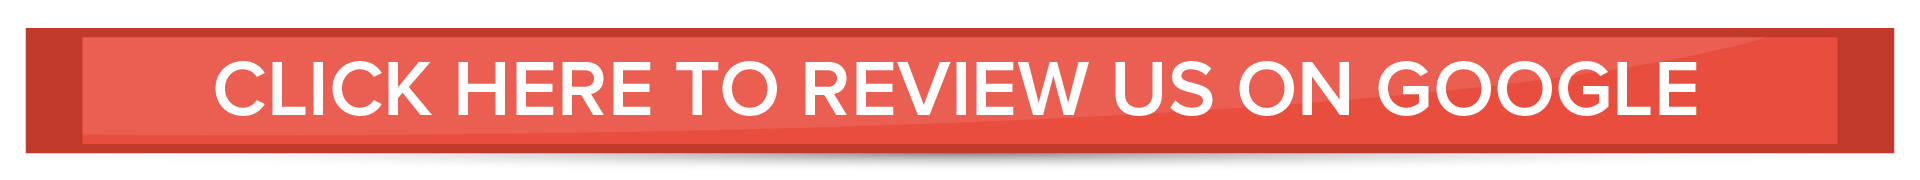 5 Corners Dodge Chrysler Jeep Ram | New Chrysler, Dodge, Jeep, Ram